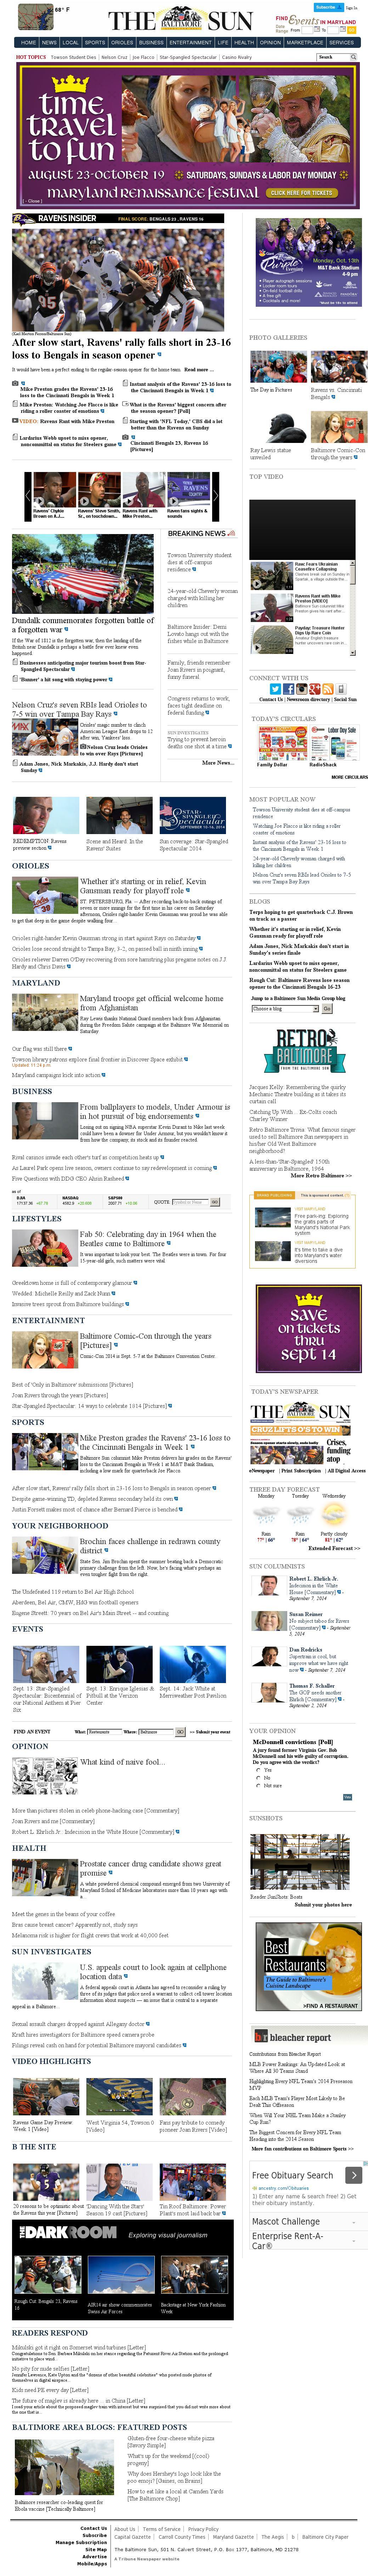 The Baltimore Sun at Monday Sept. 8, 2014, 6 a.m. UTC